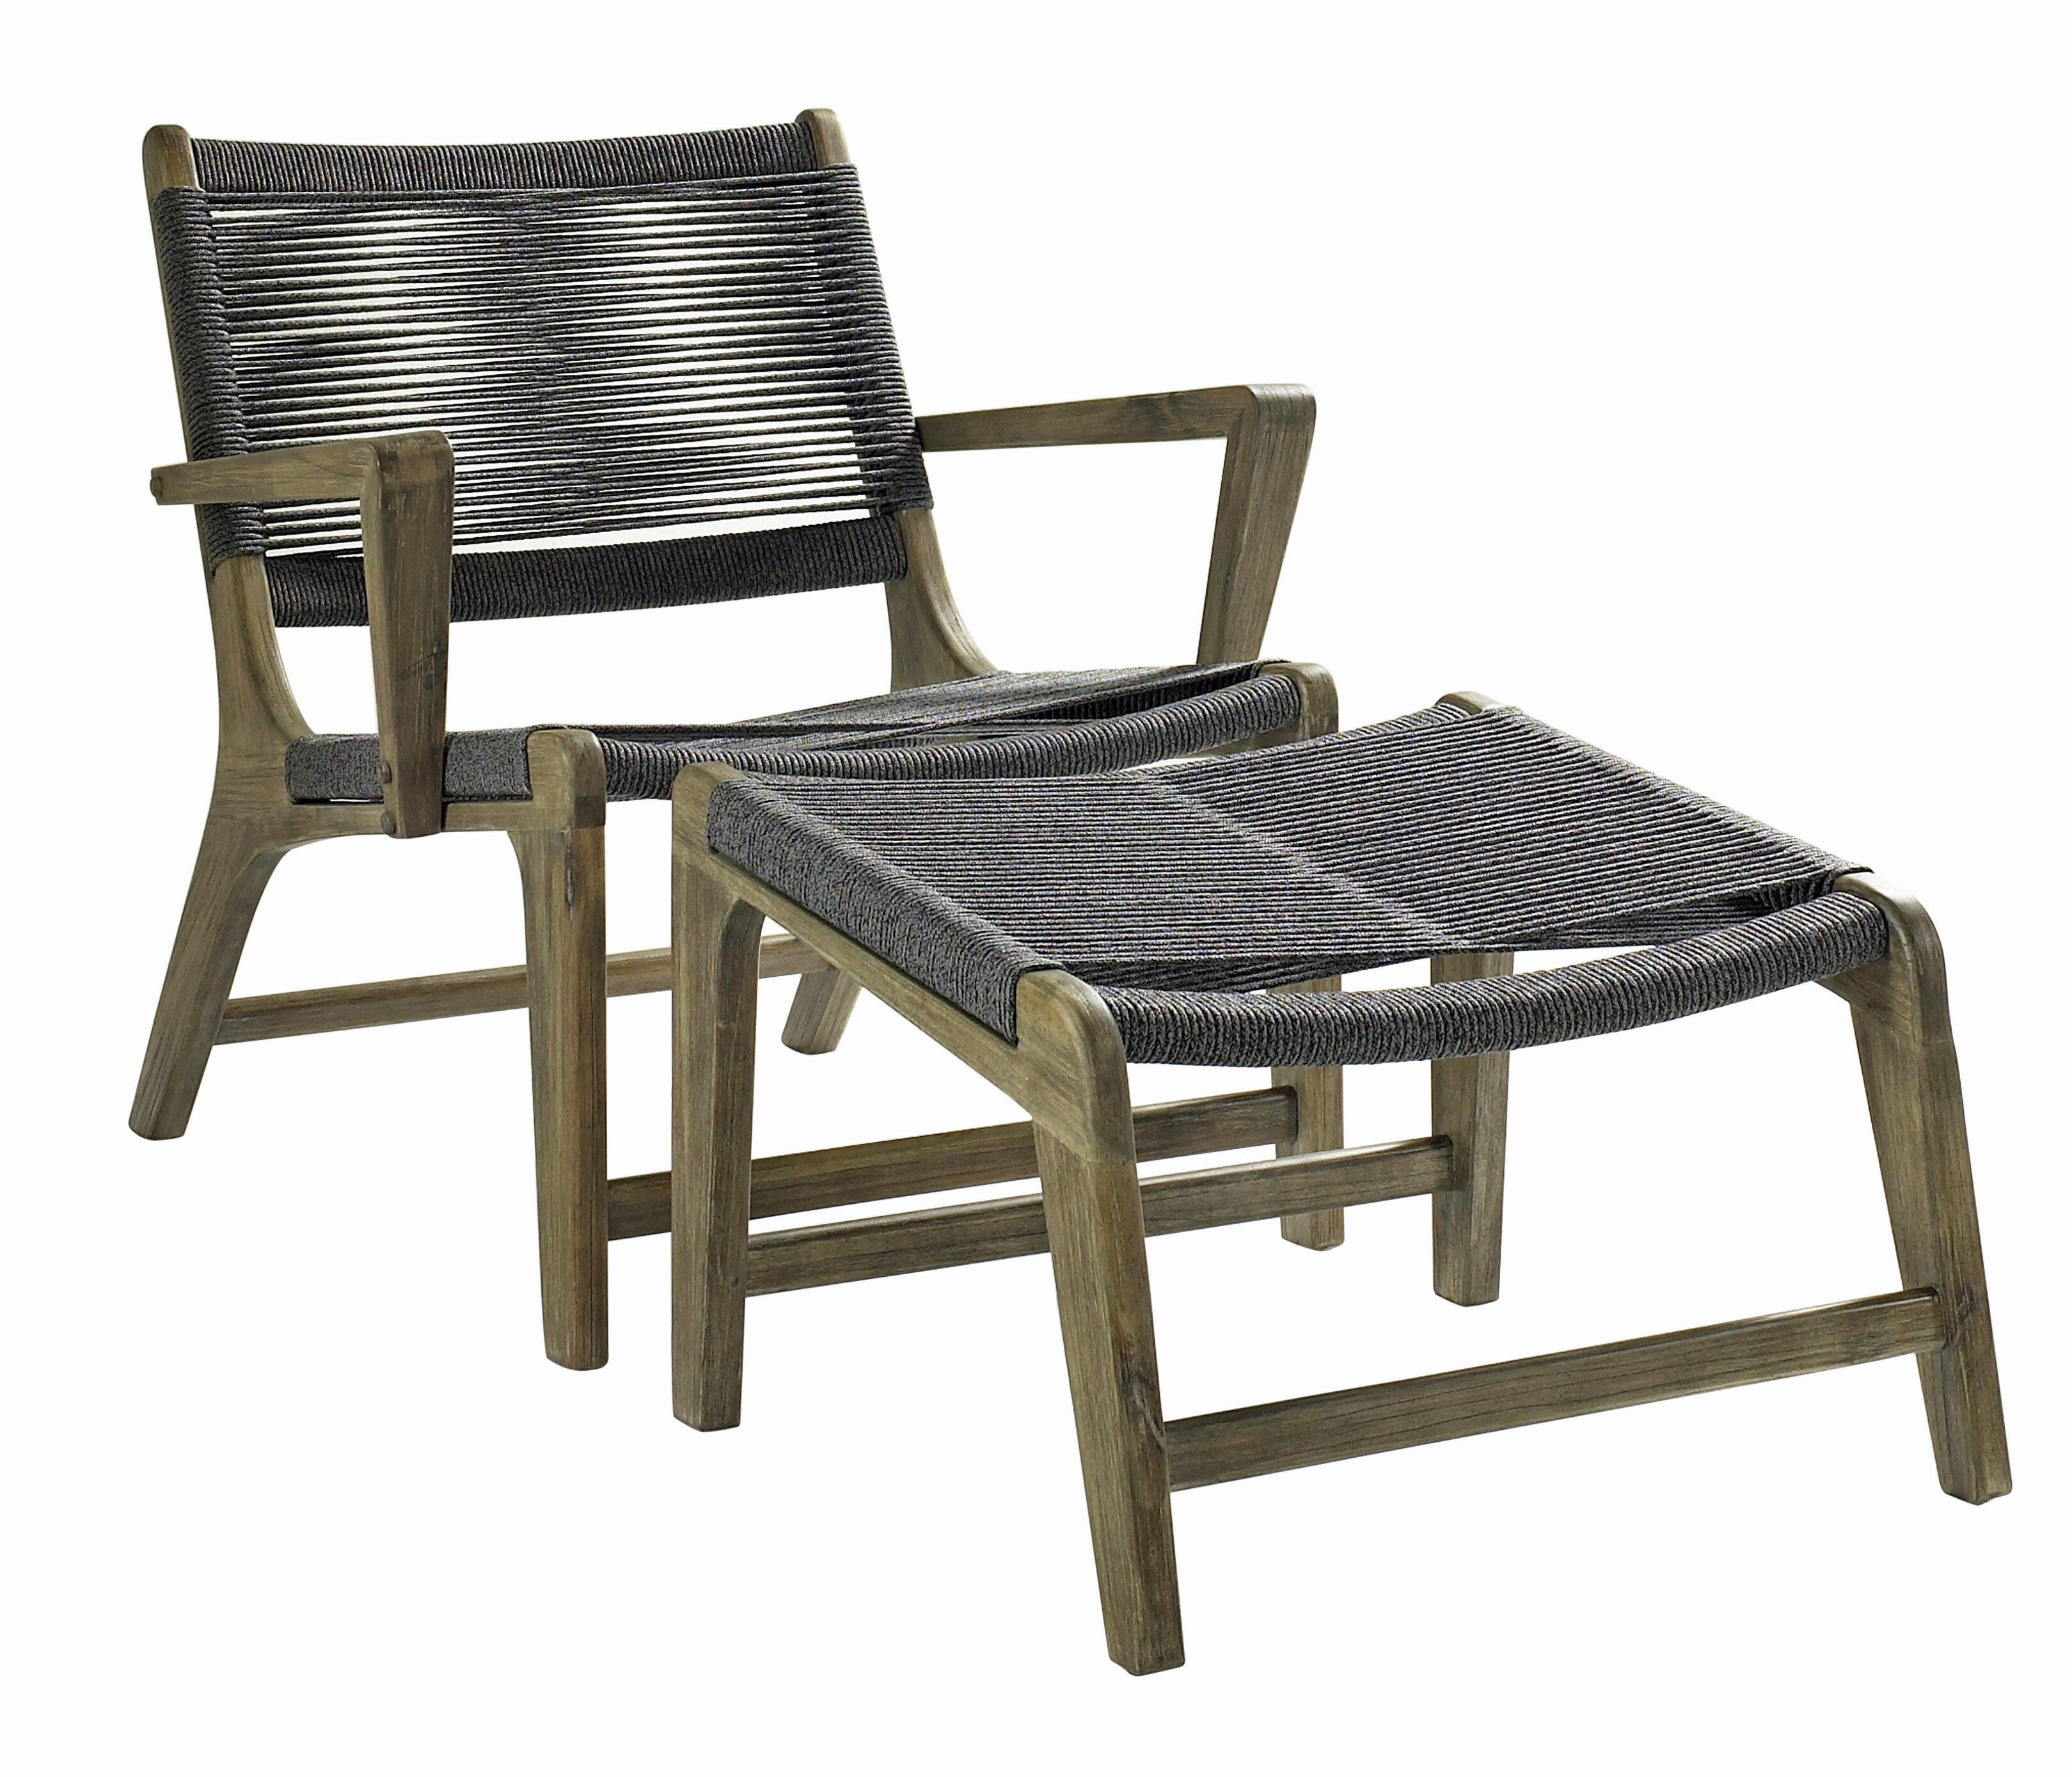 SeasonalLiving 2 Piece Oceans Outdoor Lounge Patio Chair Set